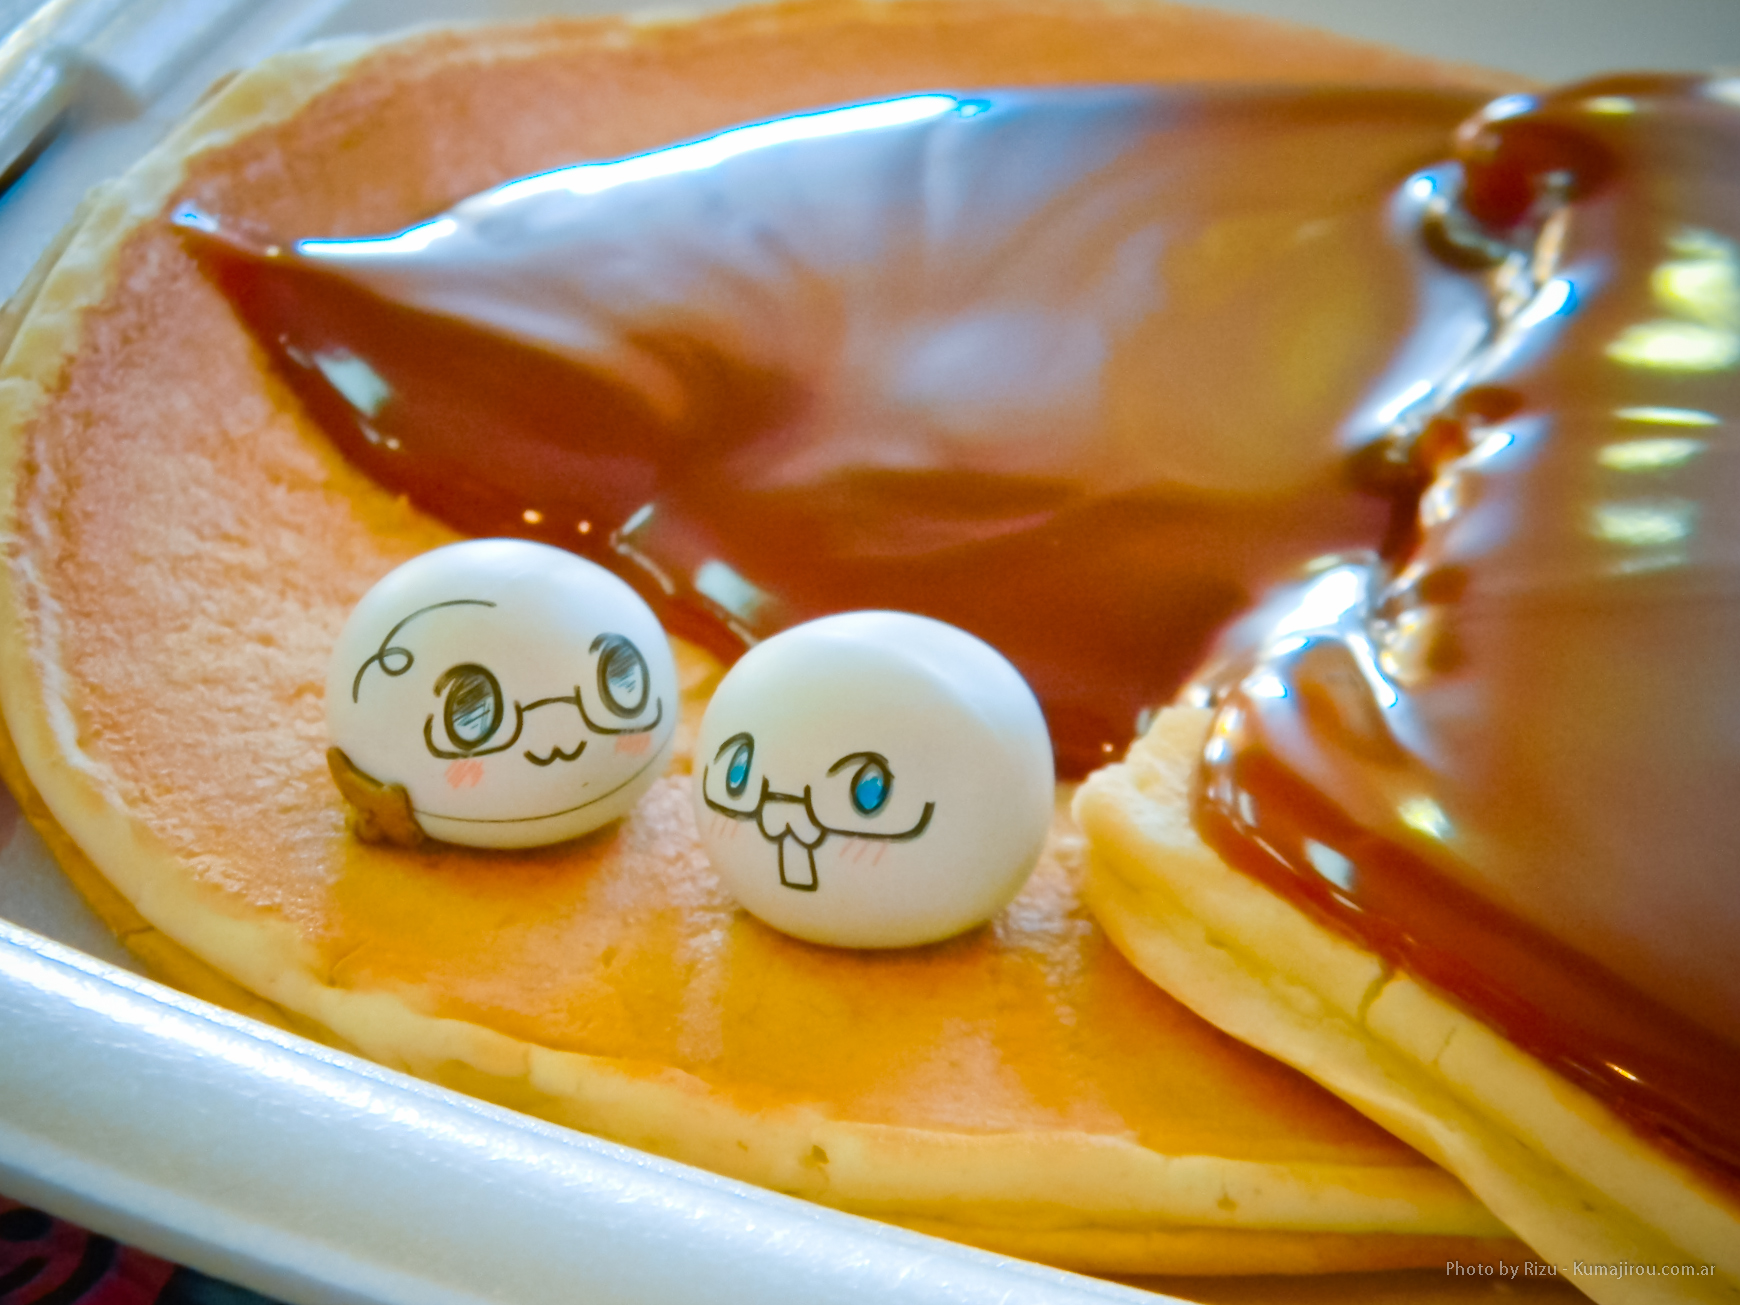 kotobukiya america canada hetalia_axis_powers togita_keijirou tatsuya_hattori earphone_jack_accessory